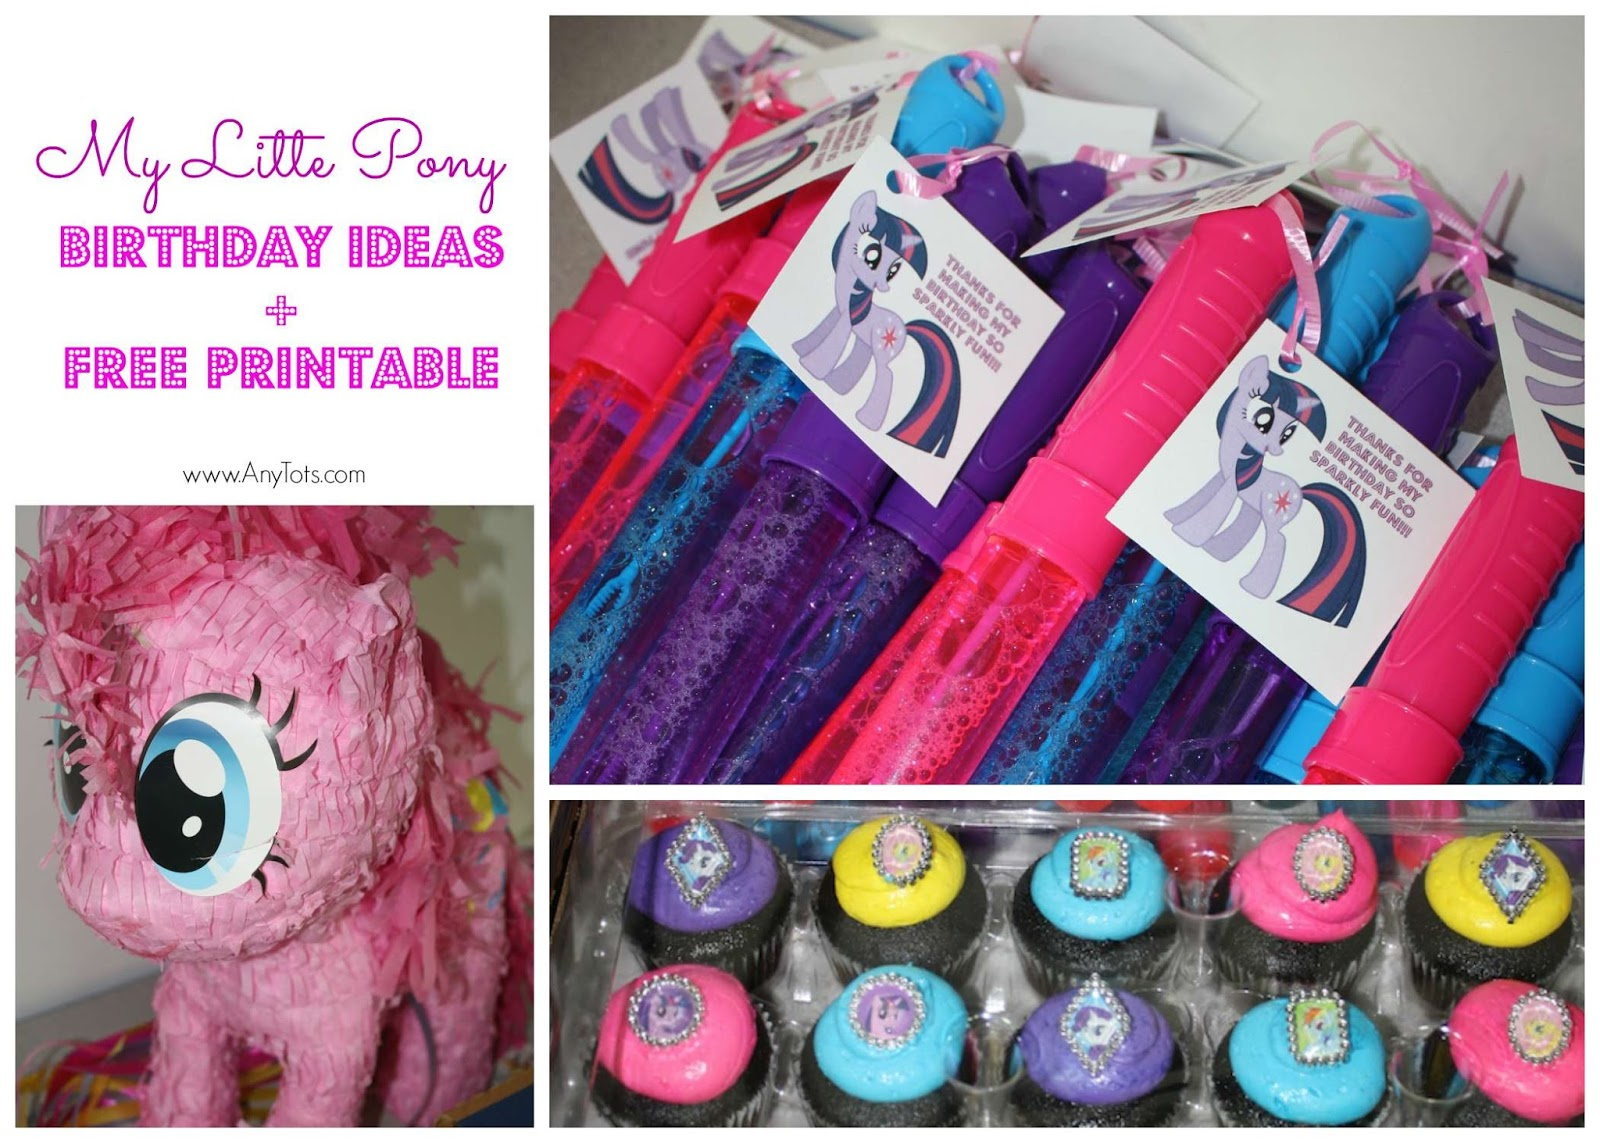 My Little Pony Birthday Ideas Free Printables